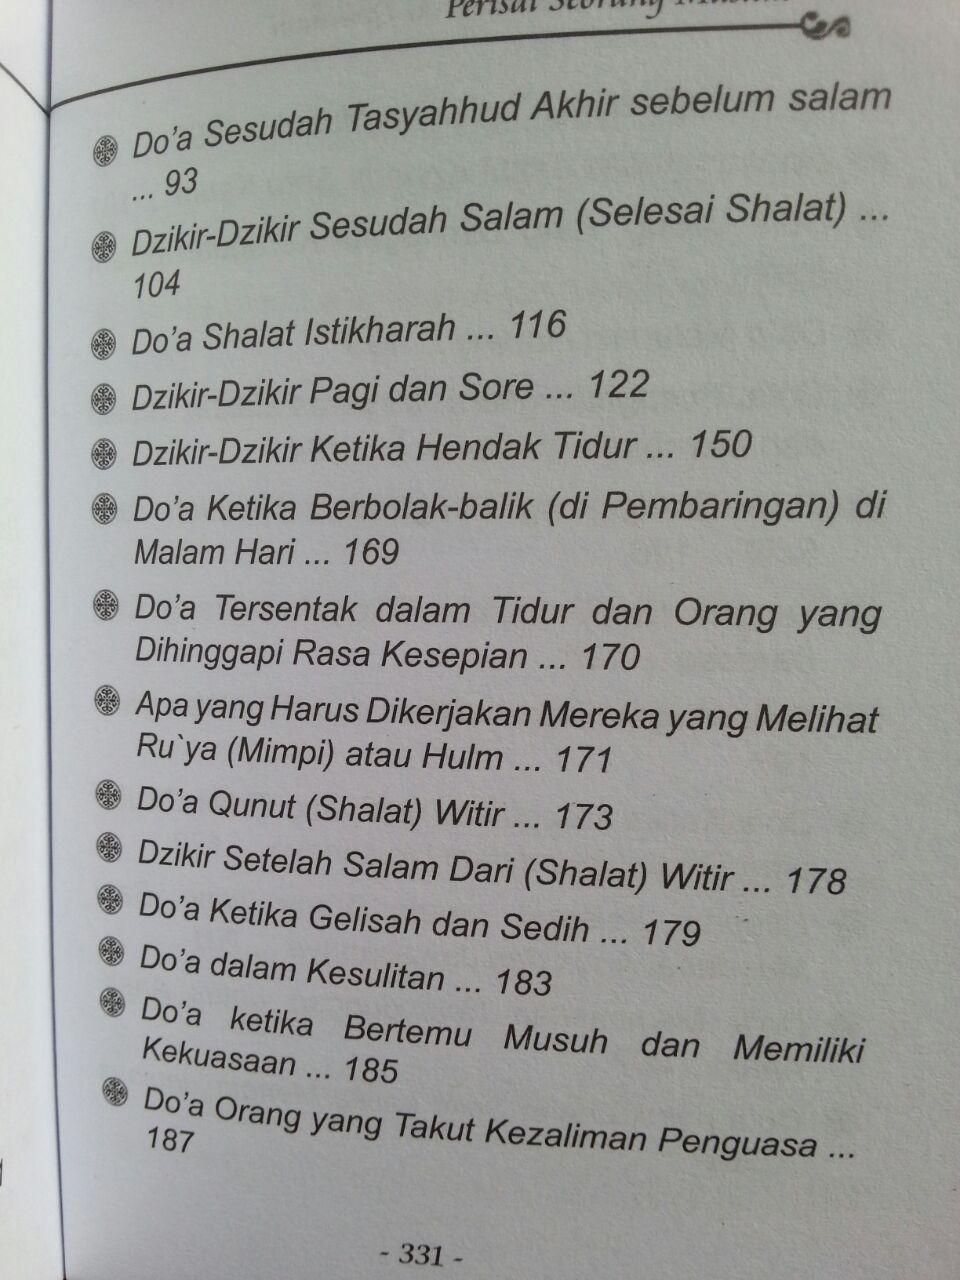 Buku Saku Perisai Seorang Muslim isi